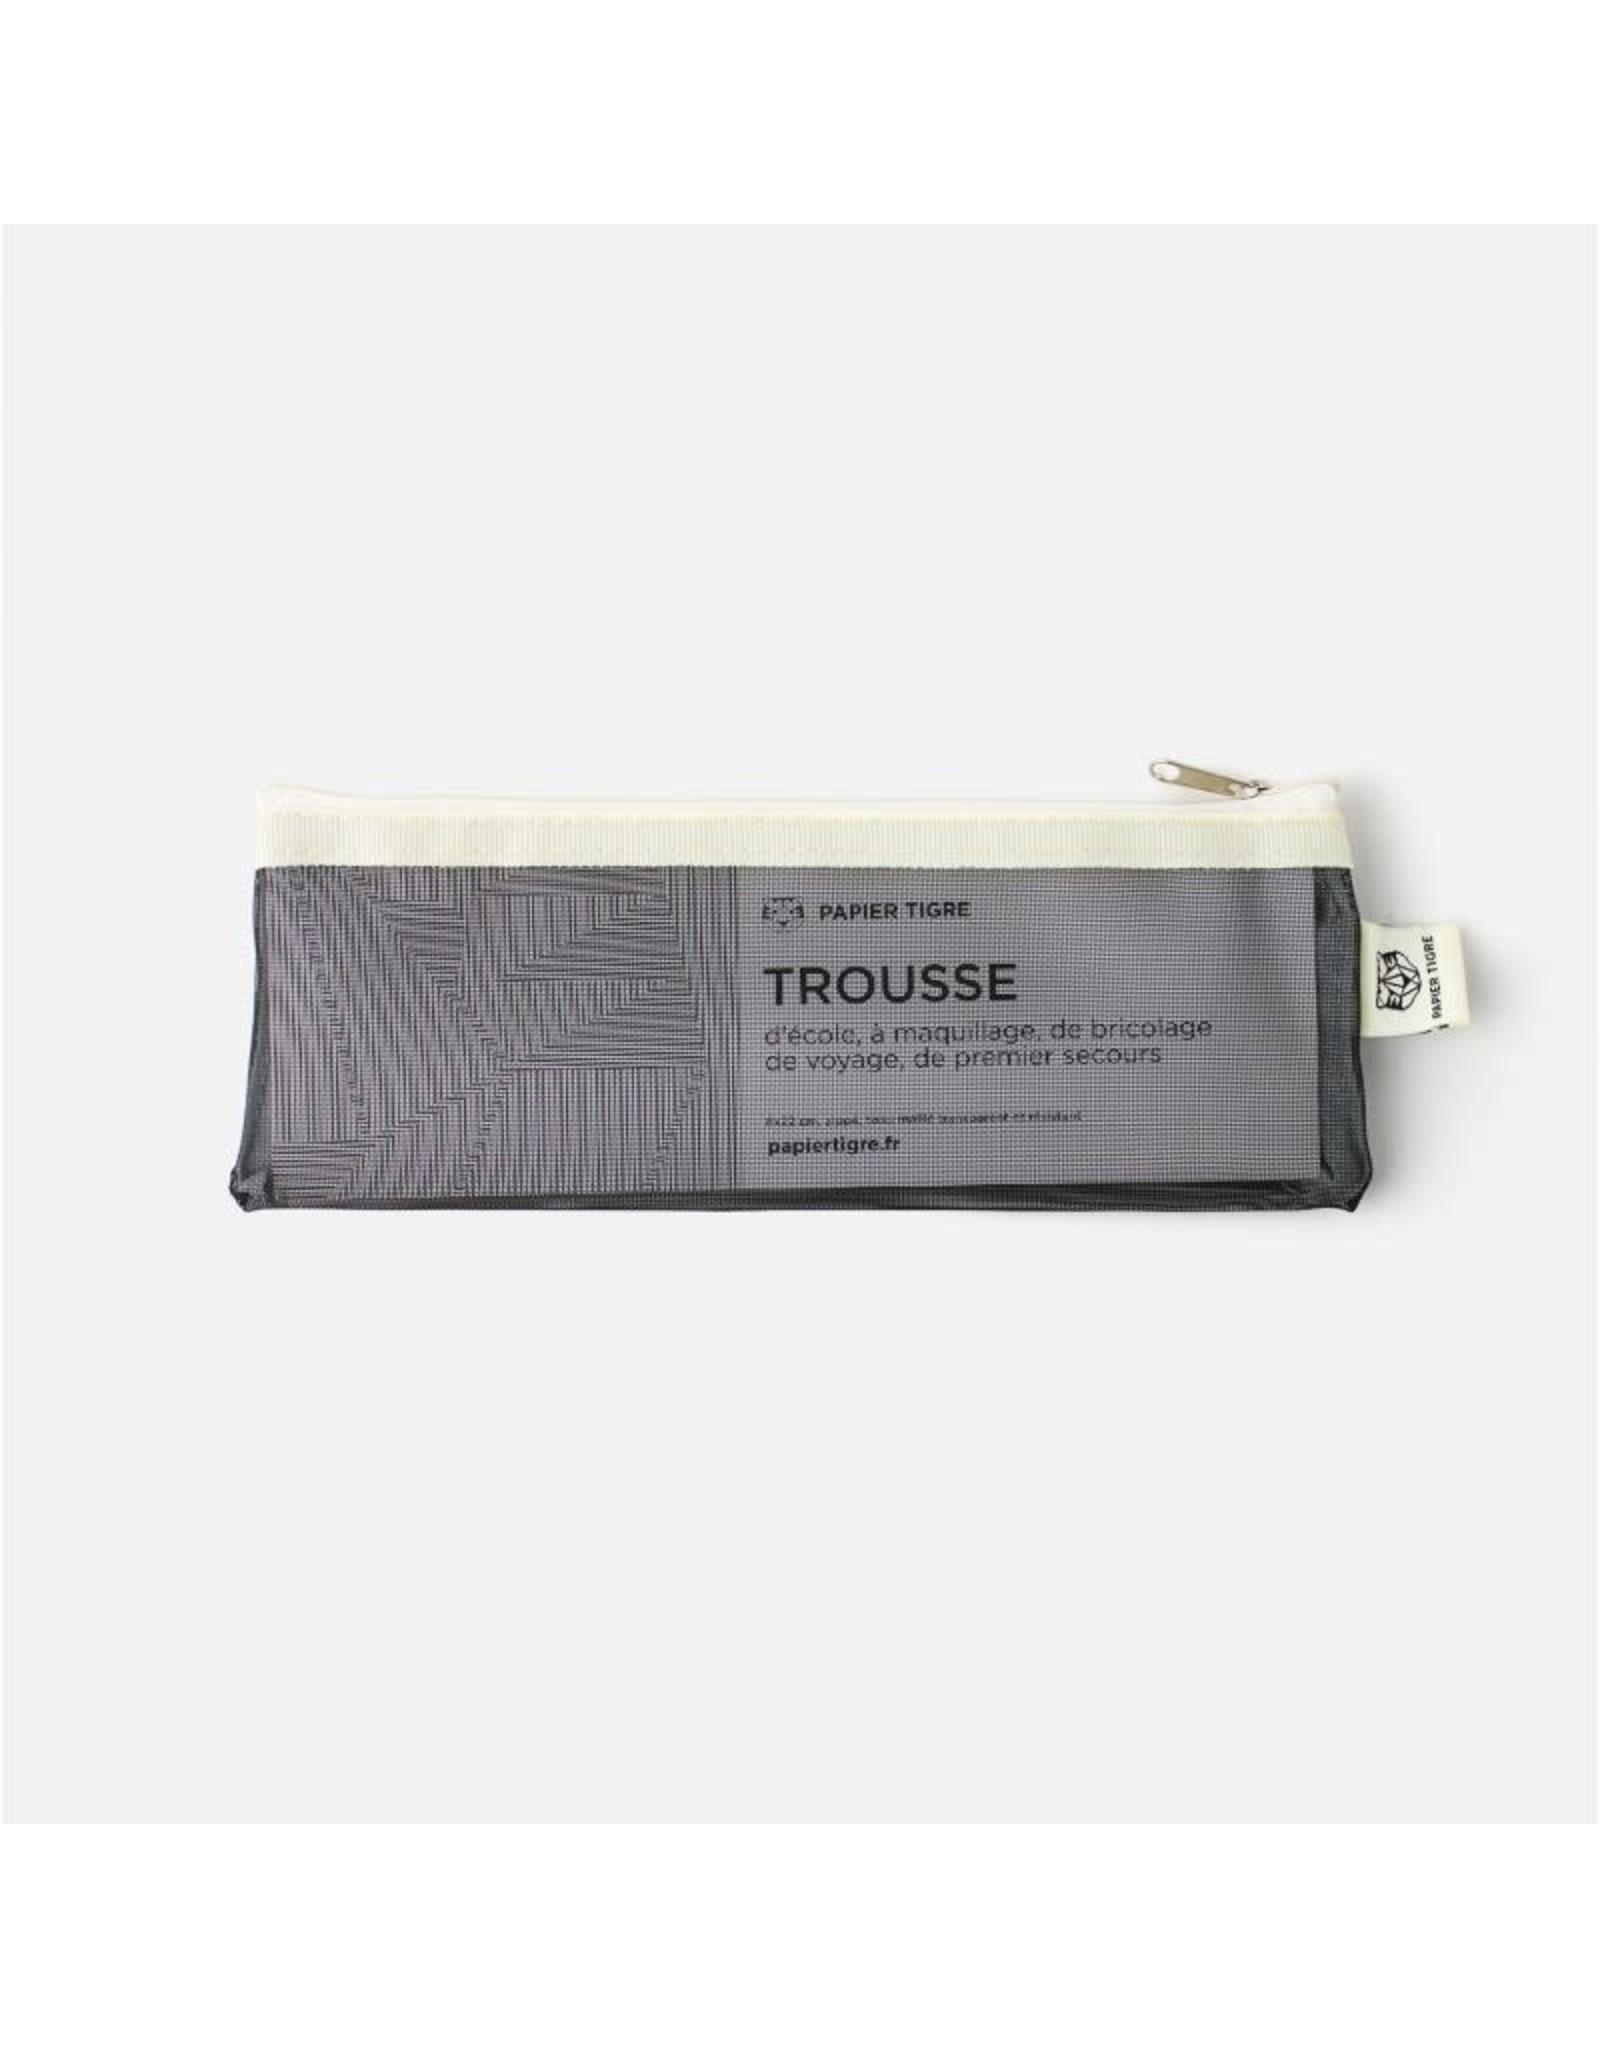 Papier Tigre Black & Cream Pencil Case